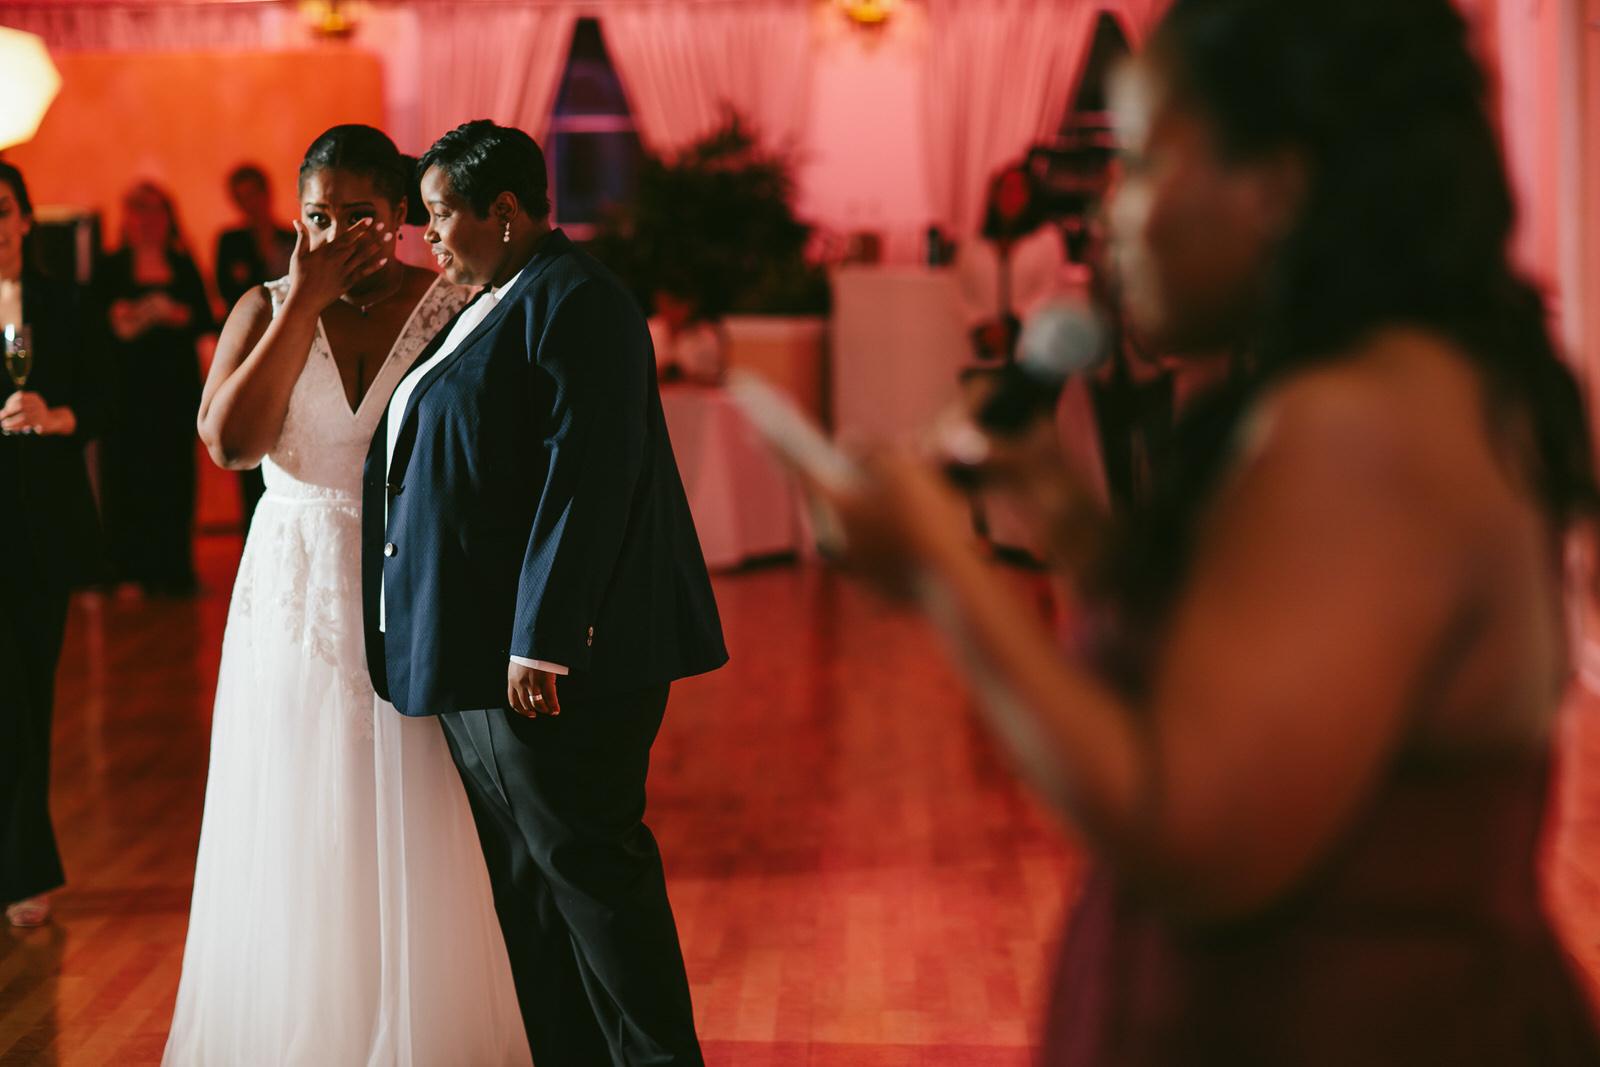 Benvenuto_Wedding_Reception_Tiny_House_Photo_Speeches.jpg